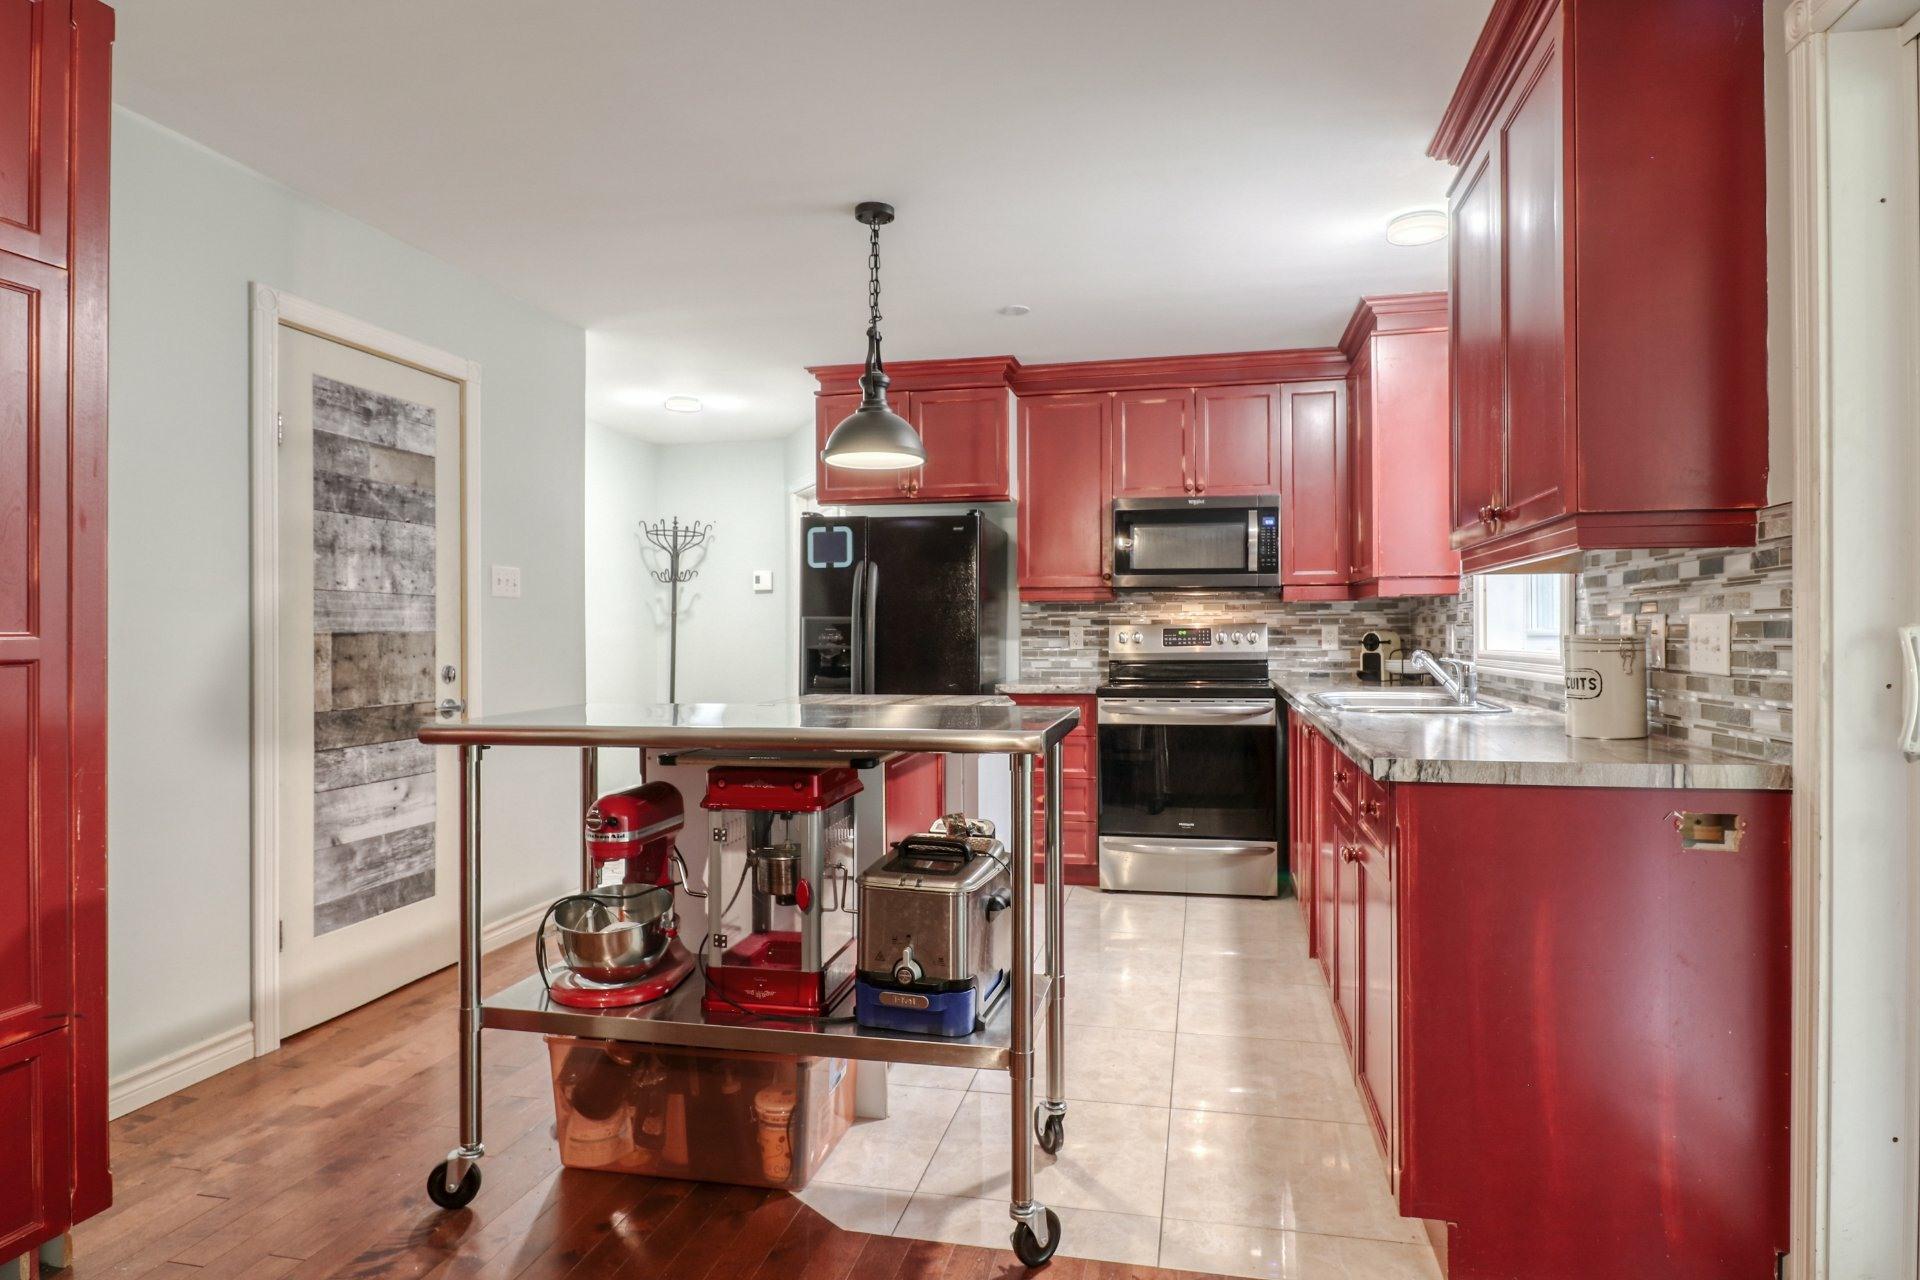 image 5 - Duplex For sale Rawdon - 9 rooms